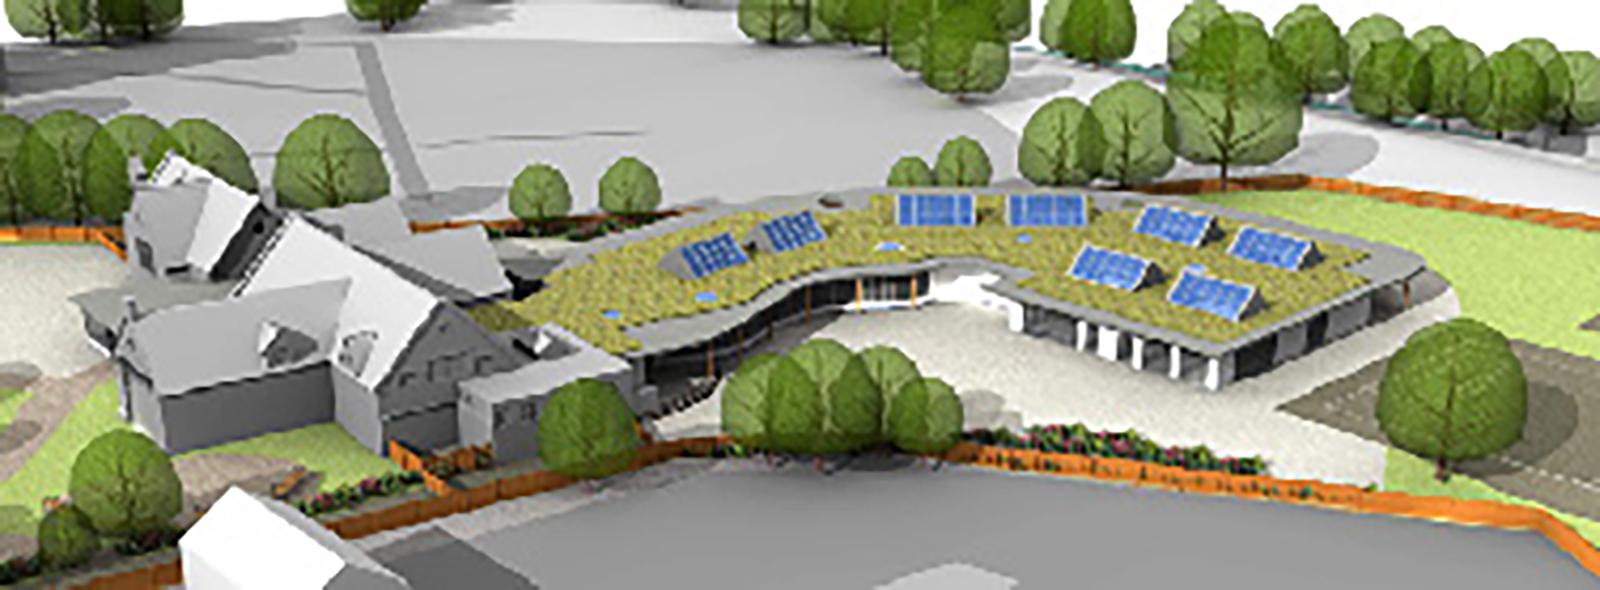 Low Carbon M&E Project Cookley Sebright School, Redevelopment